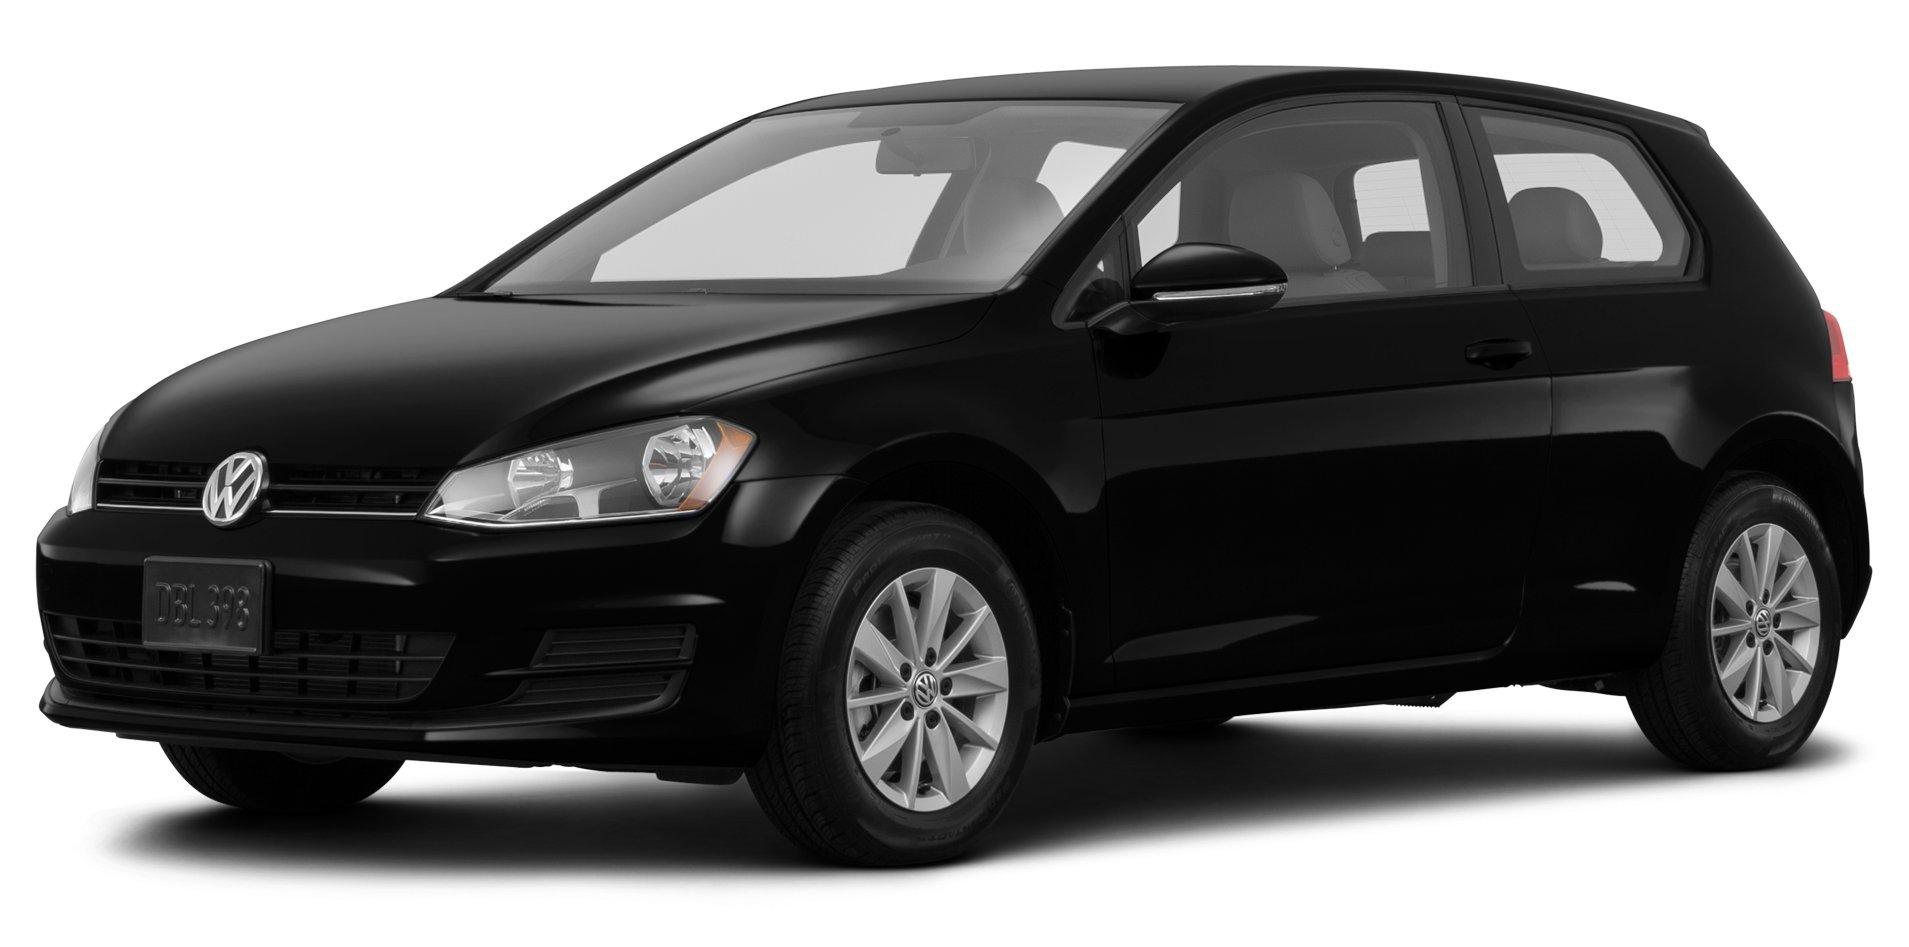 2015 Volkswagen Golf Launch Edition, 2-Door Hatchback Manual Transmission  ...